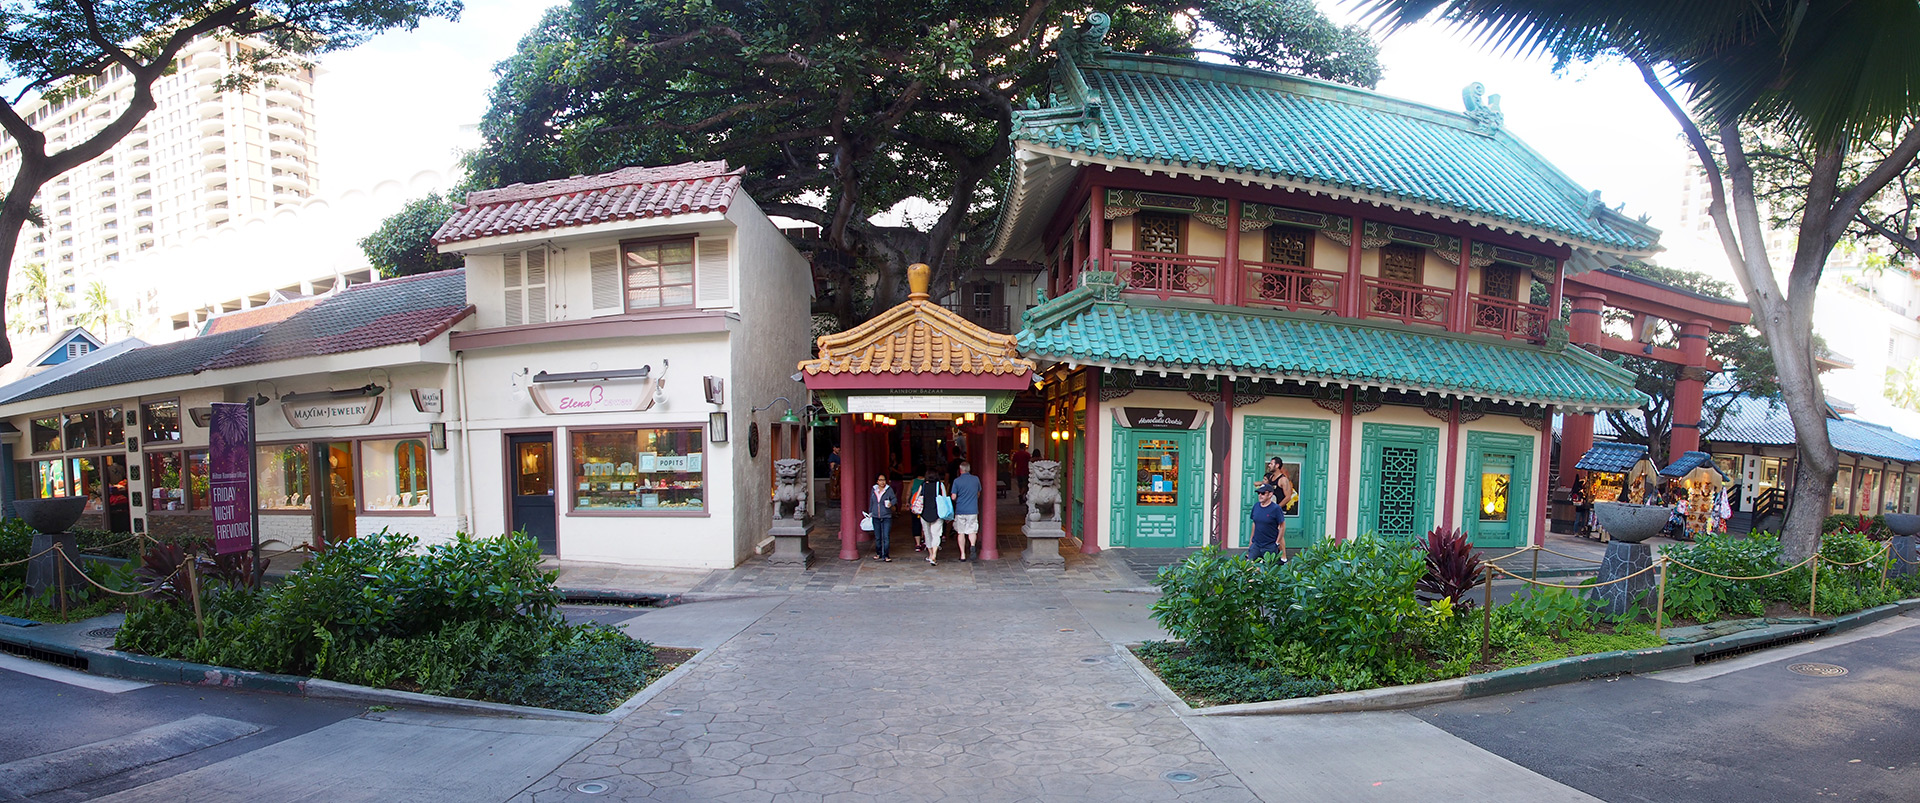 Rainbow Bazaar entrance Waikiki